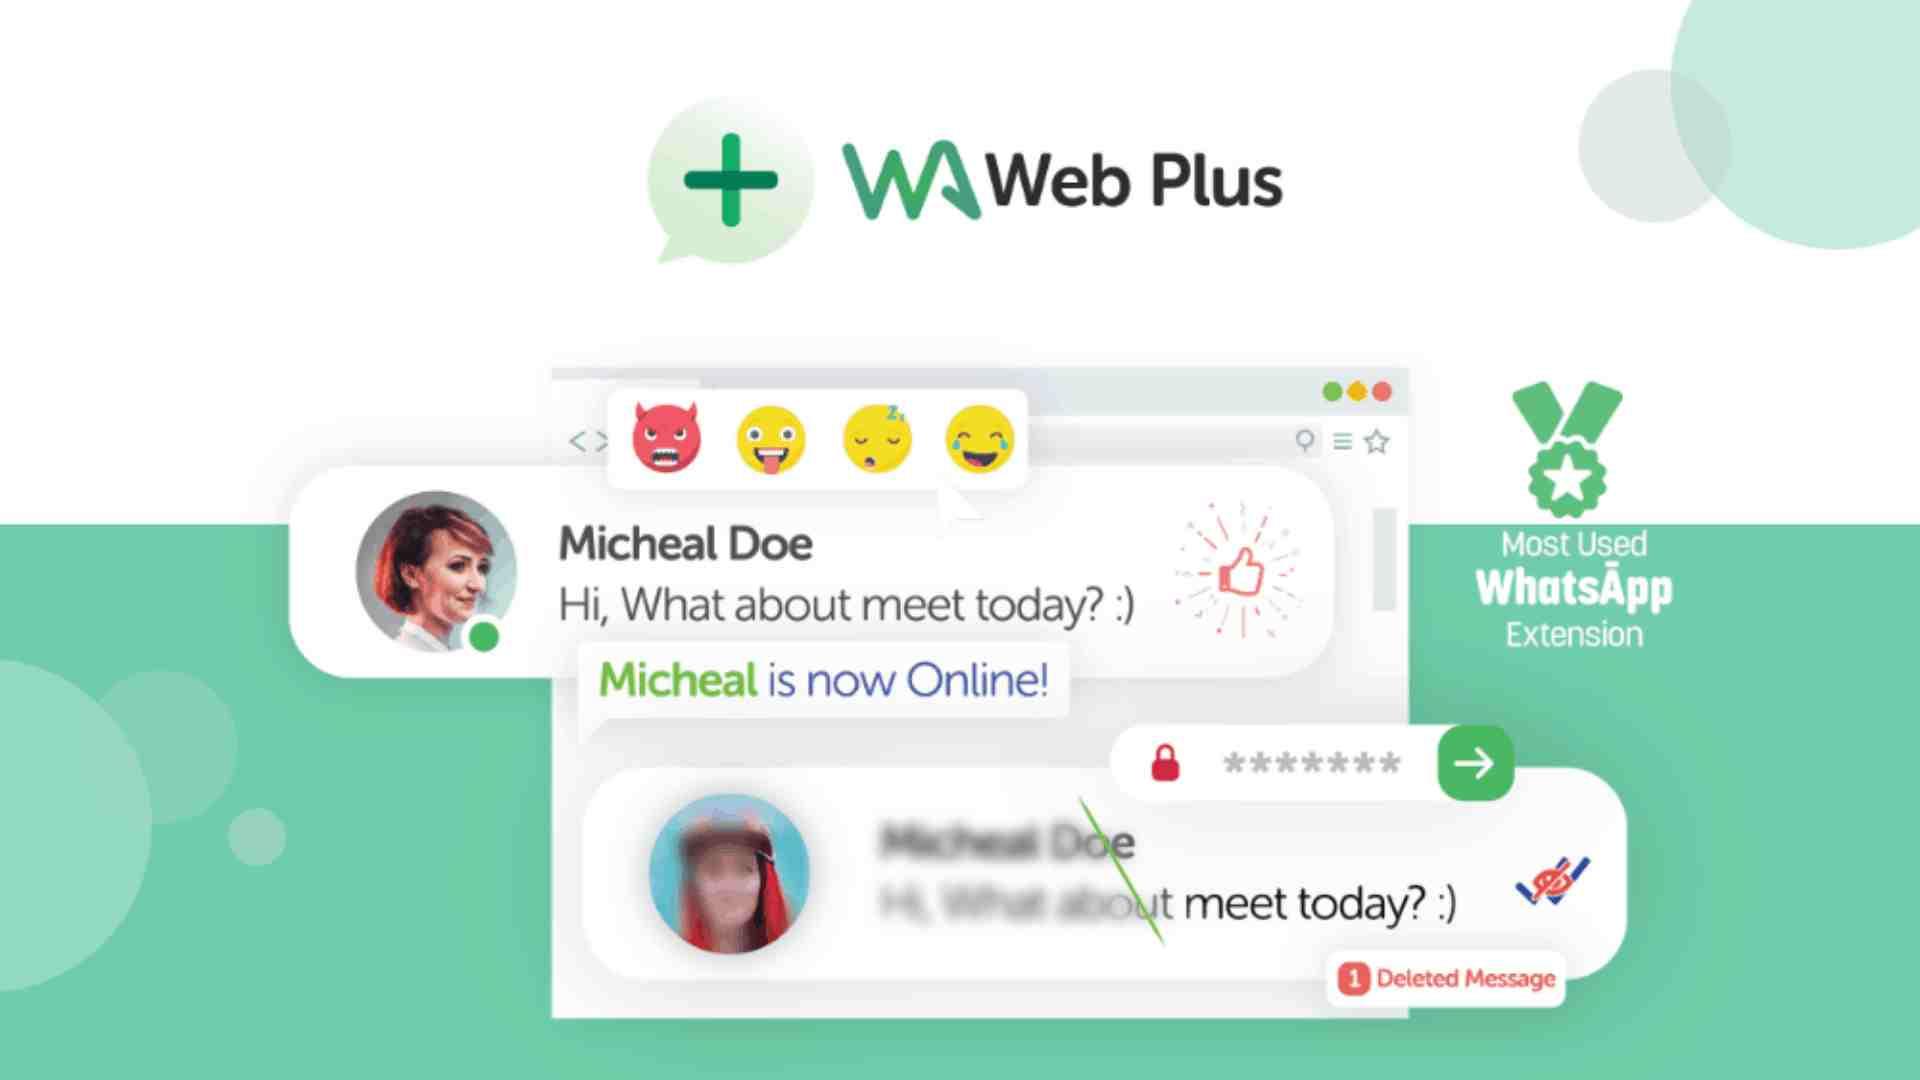 aplikasi whatsapp web plus